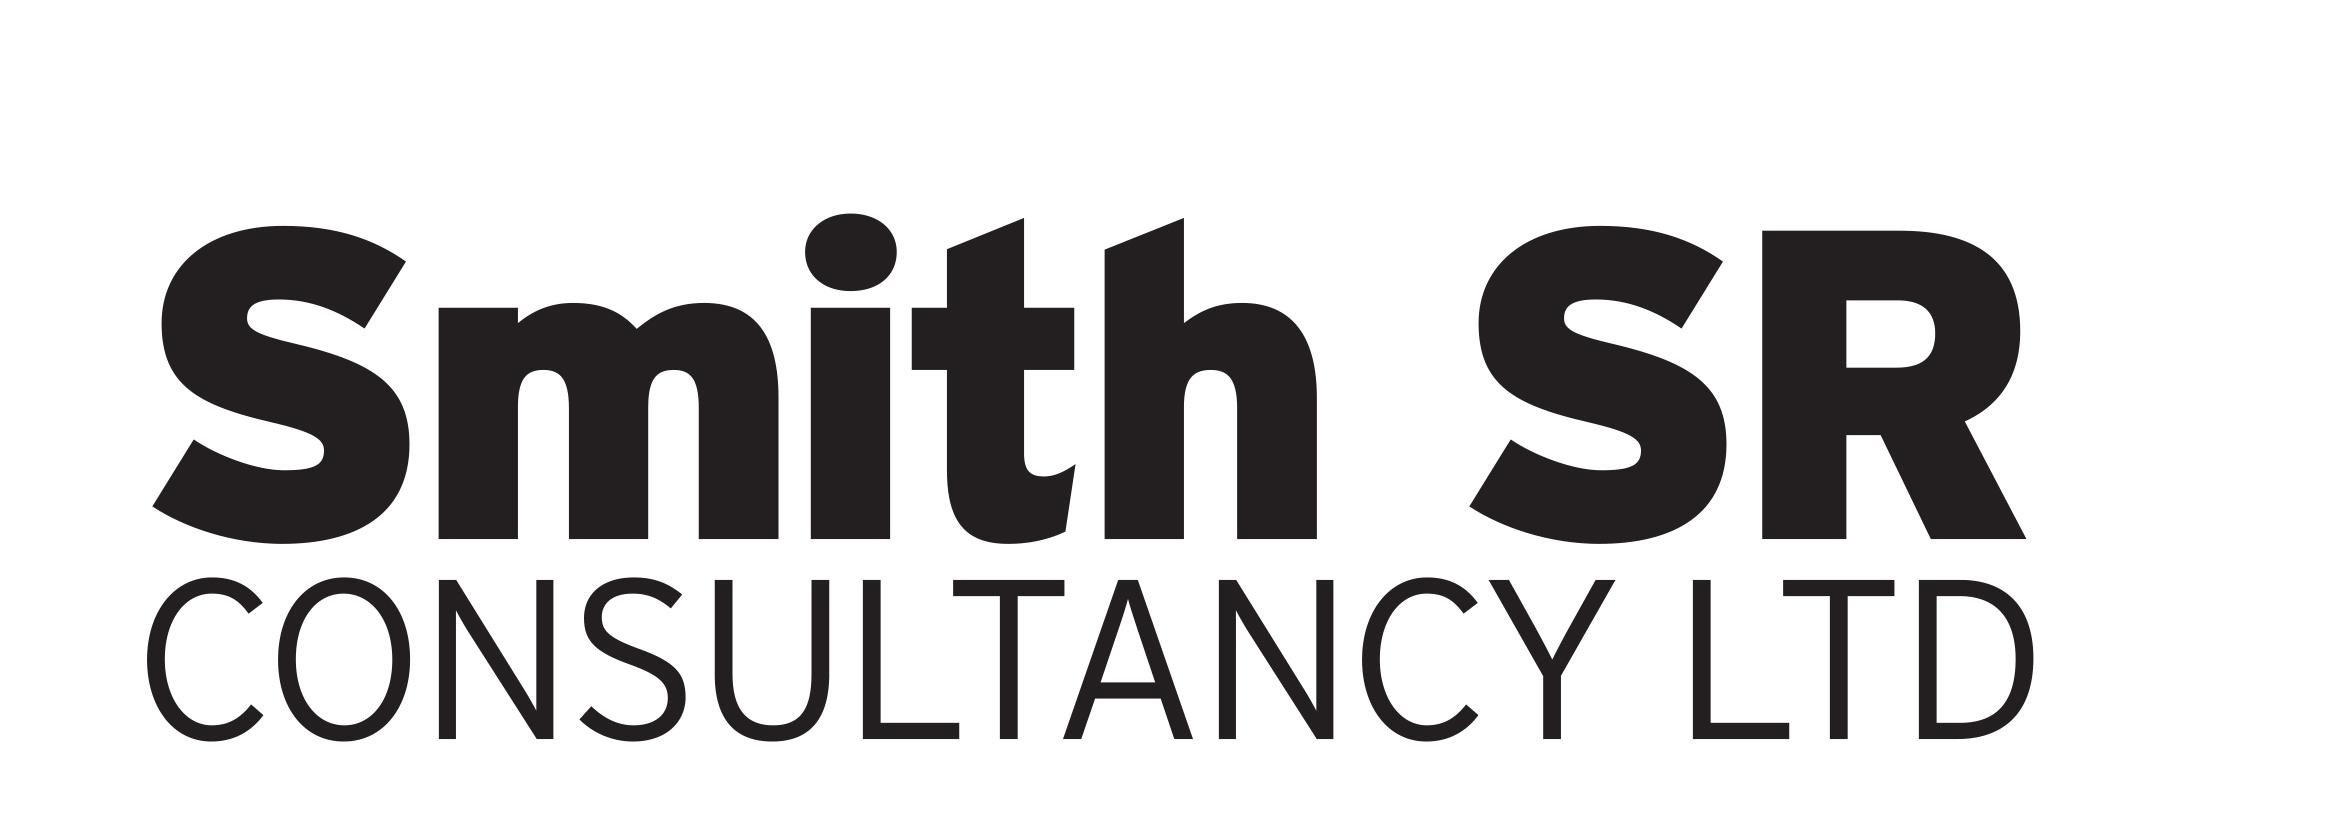 Smith SR consultancy Ltd.jpg